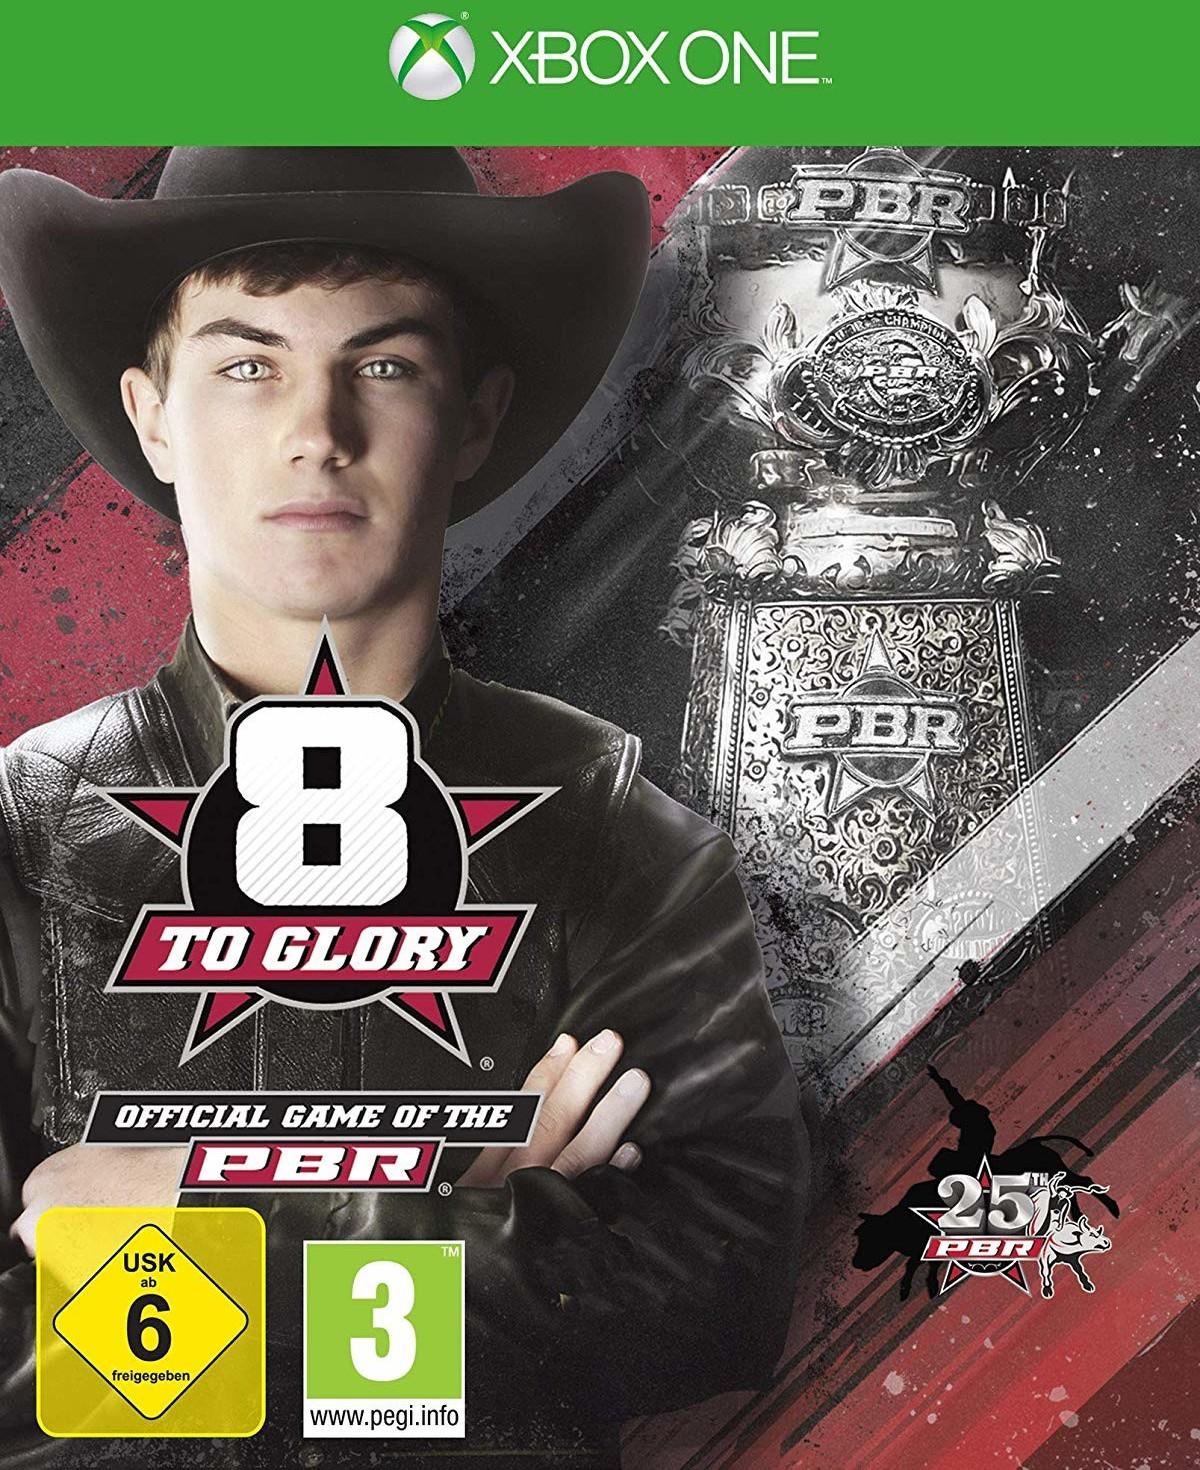 8 to Glory (Xbox One) für 9,99€ bzw. für 8,50€ (Müller & Amazon Prime)